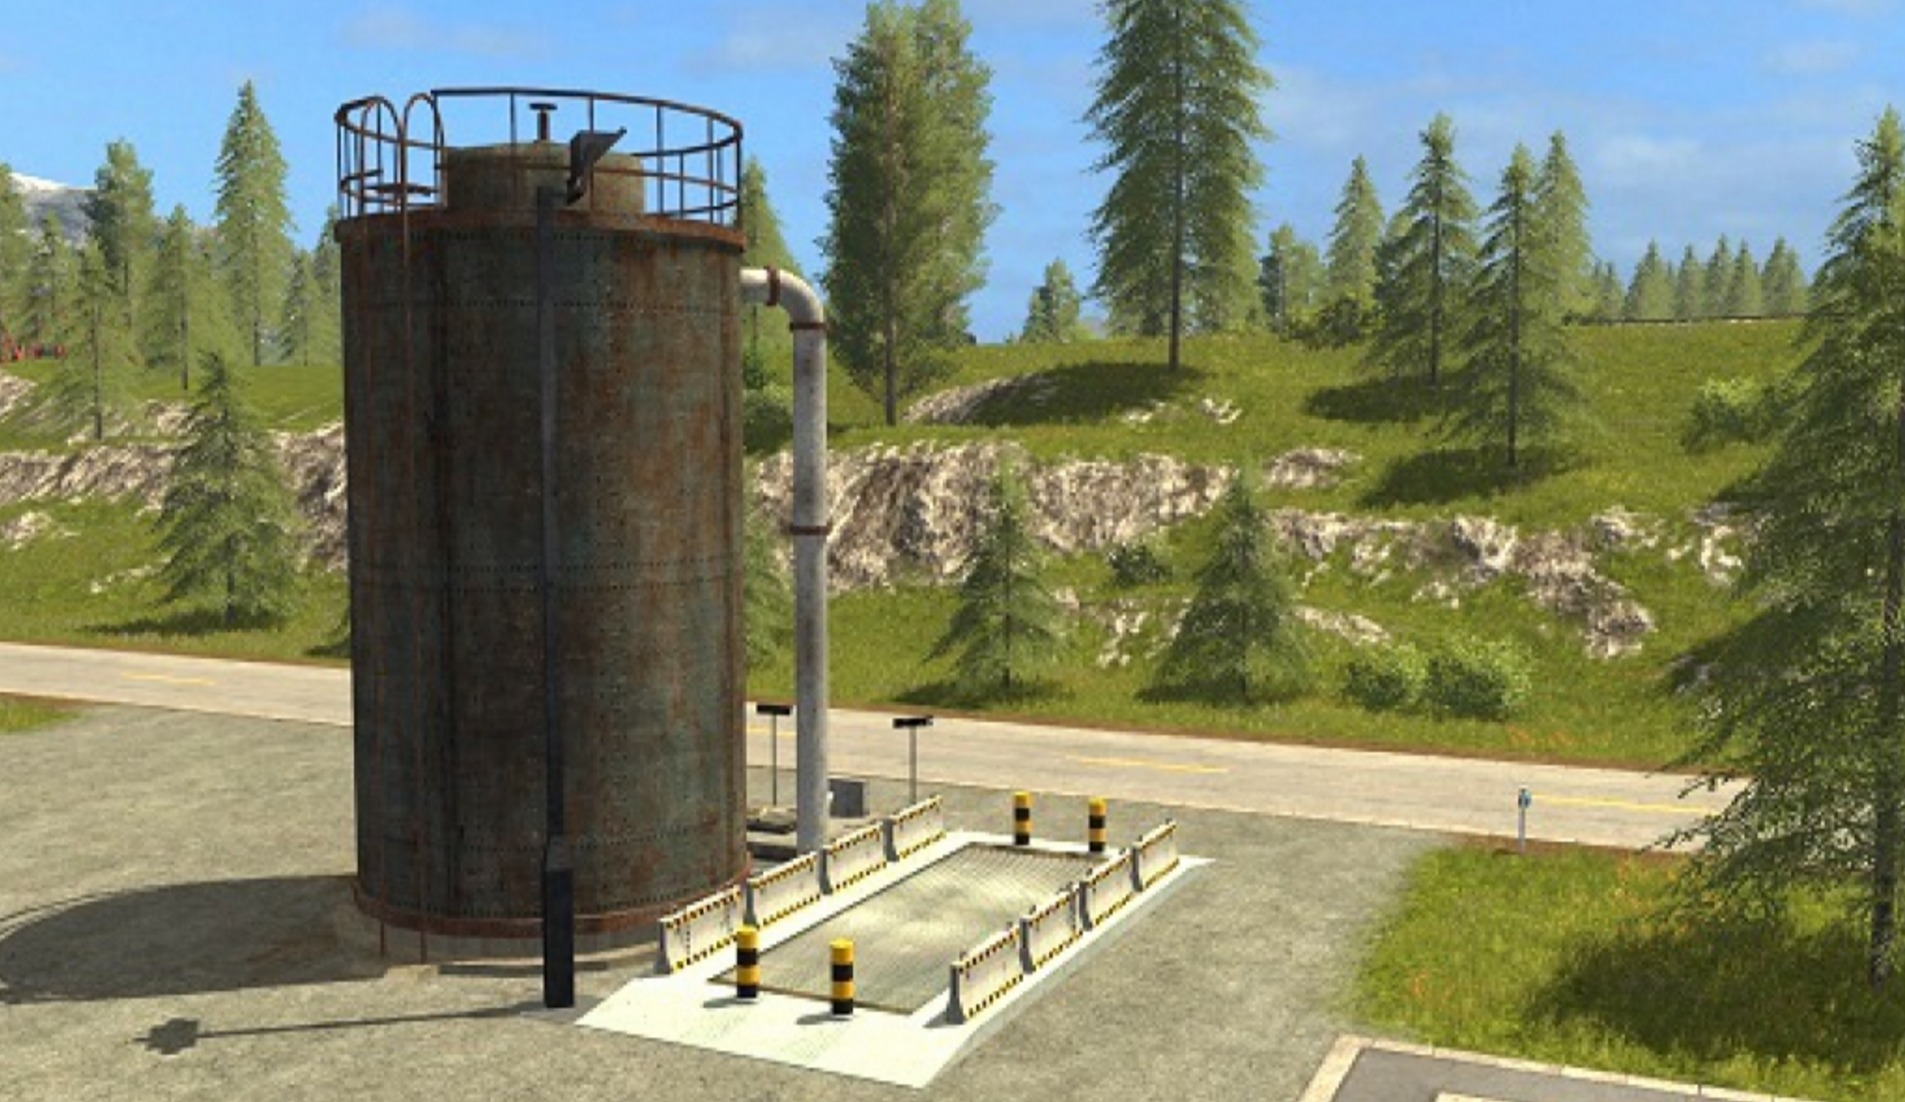 Fermenting Silo - Farming simulator 2019 / 2017 / 2015 Mods